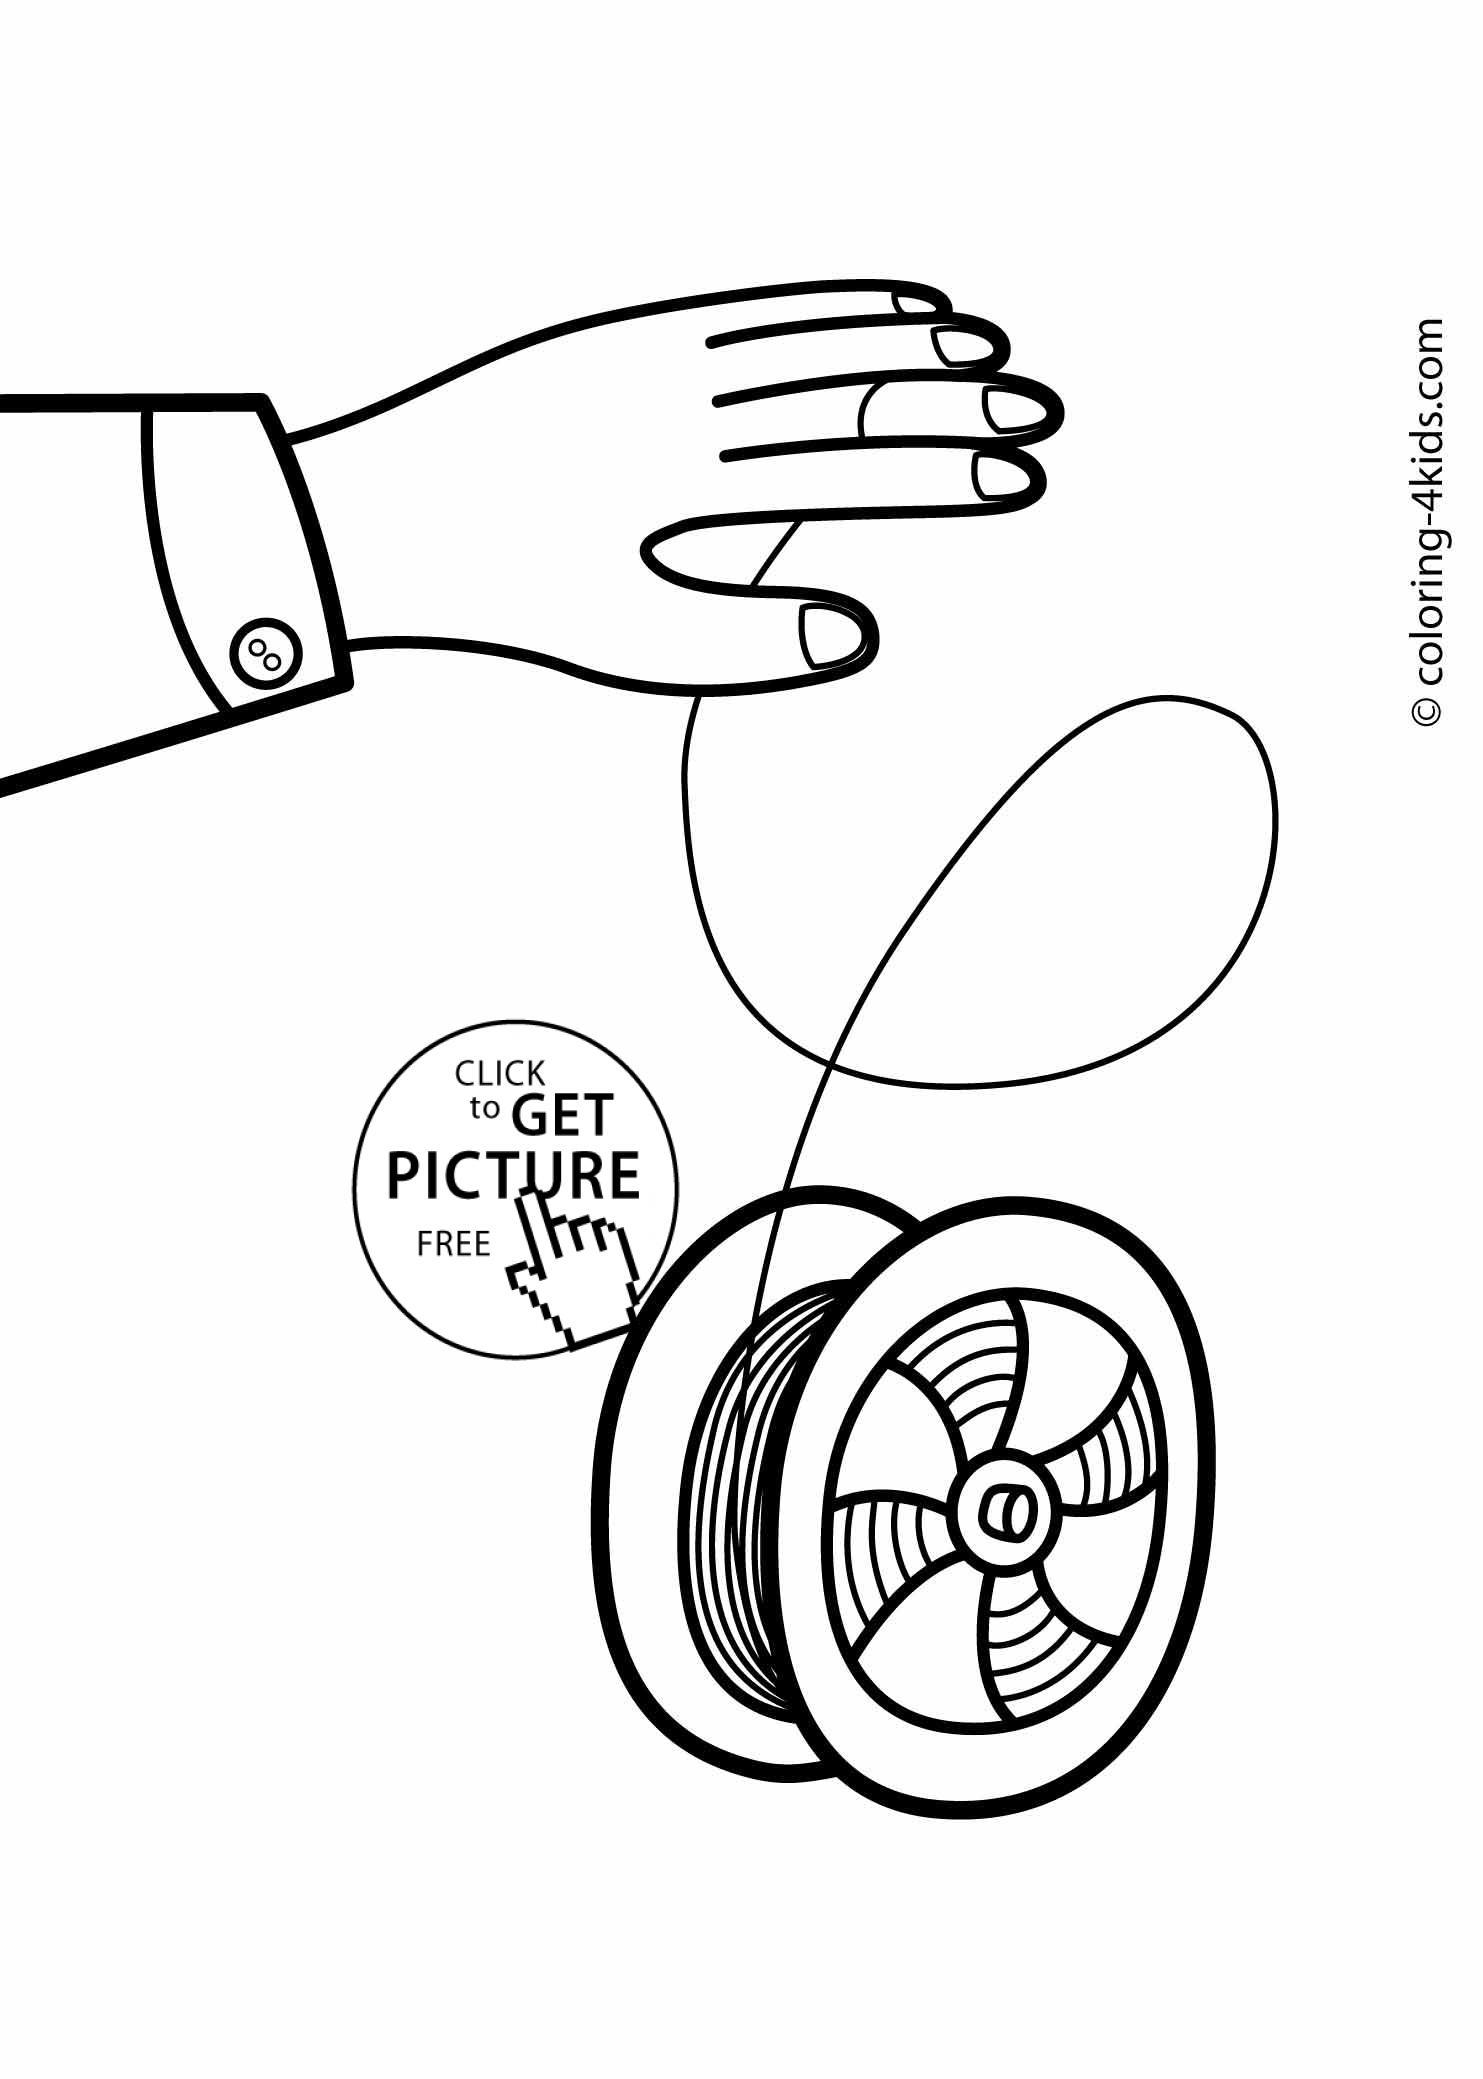 Yo-yo coloring pages for kids, printable drawing